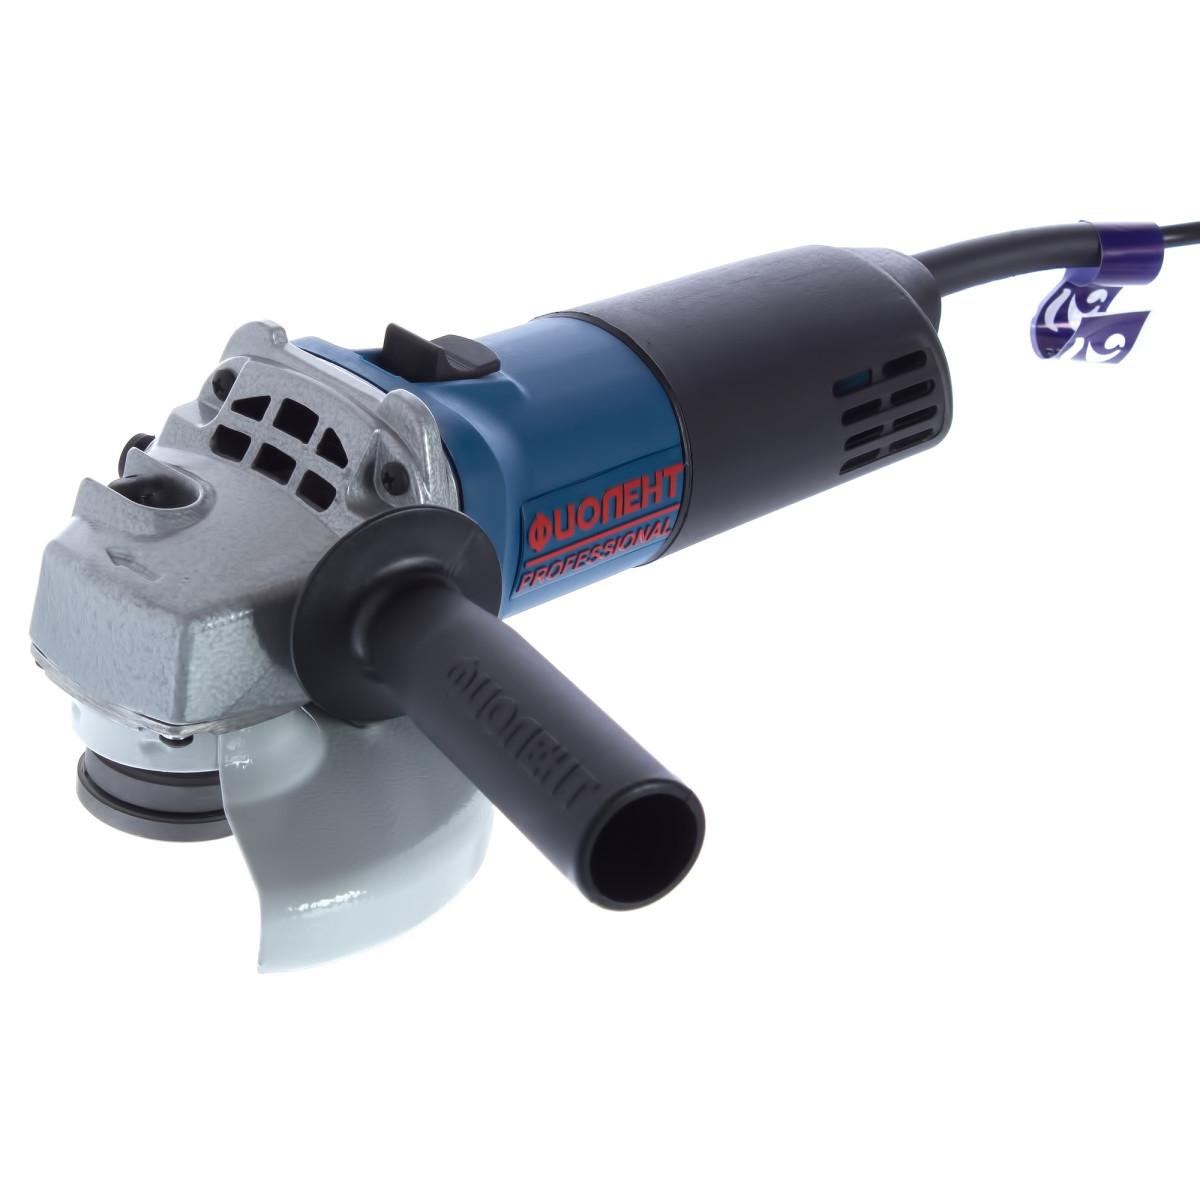 УШМ (болгарка) Фиолент МШУ2-9-125 900 Вт 125 мм